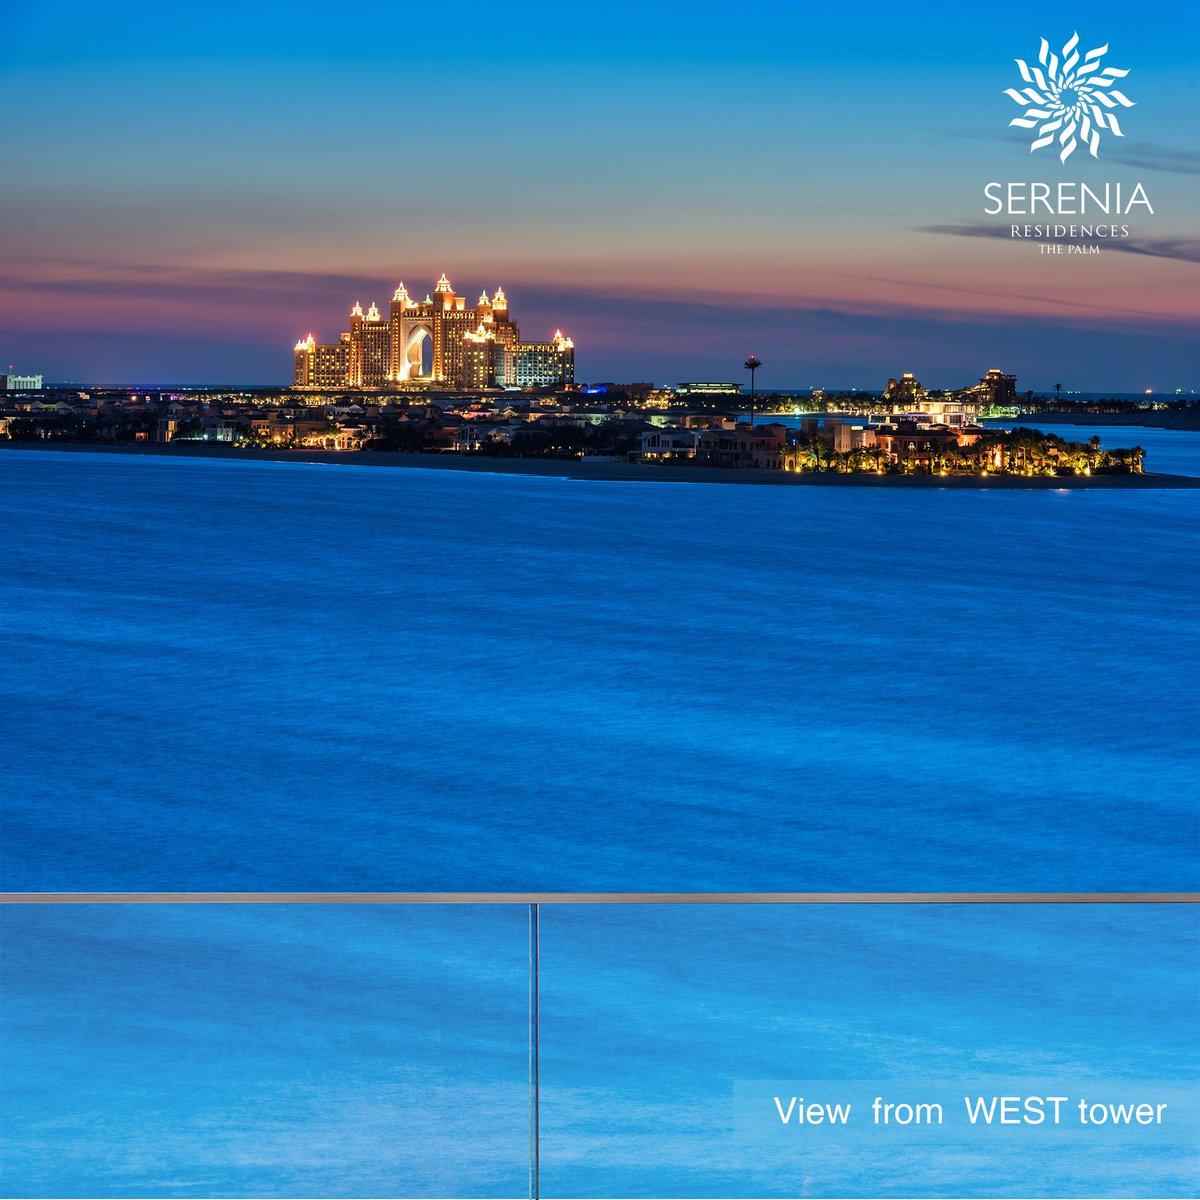 What a magical view from #SereniaThePalm!  #Palma #PalmaProjects #PalmaHolding #PalmJumeirah #DubaiProperty #BeachfrontLiving #SereniaResidences #LuxuryHomes #Exclusivity #LuxuryLifestyle #BeachView  #WonderfullView  #MagicalView